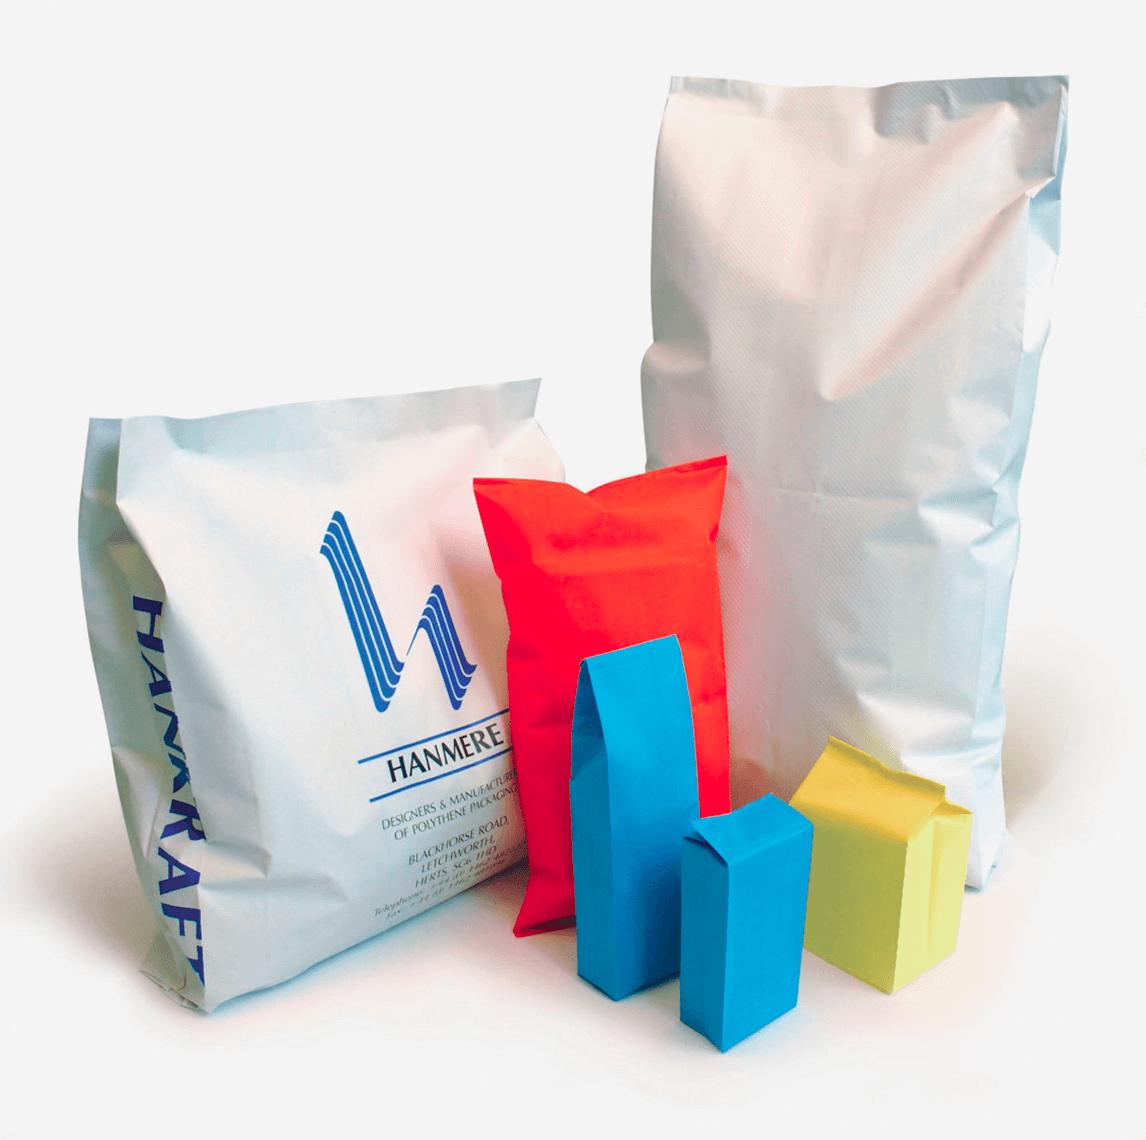 Hankraft products